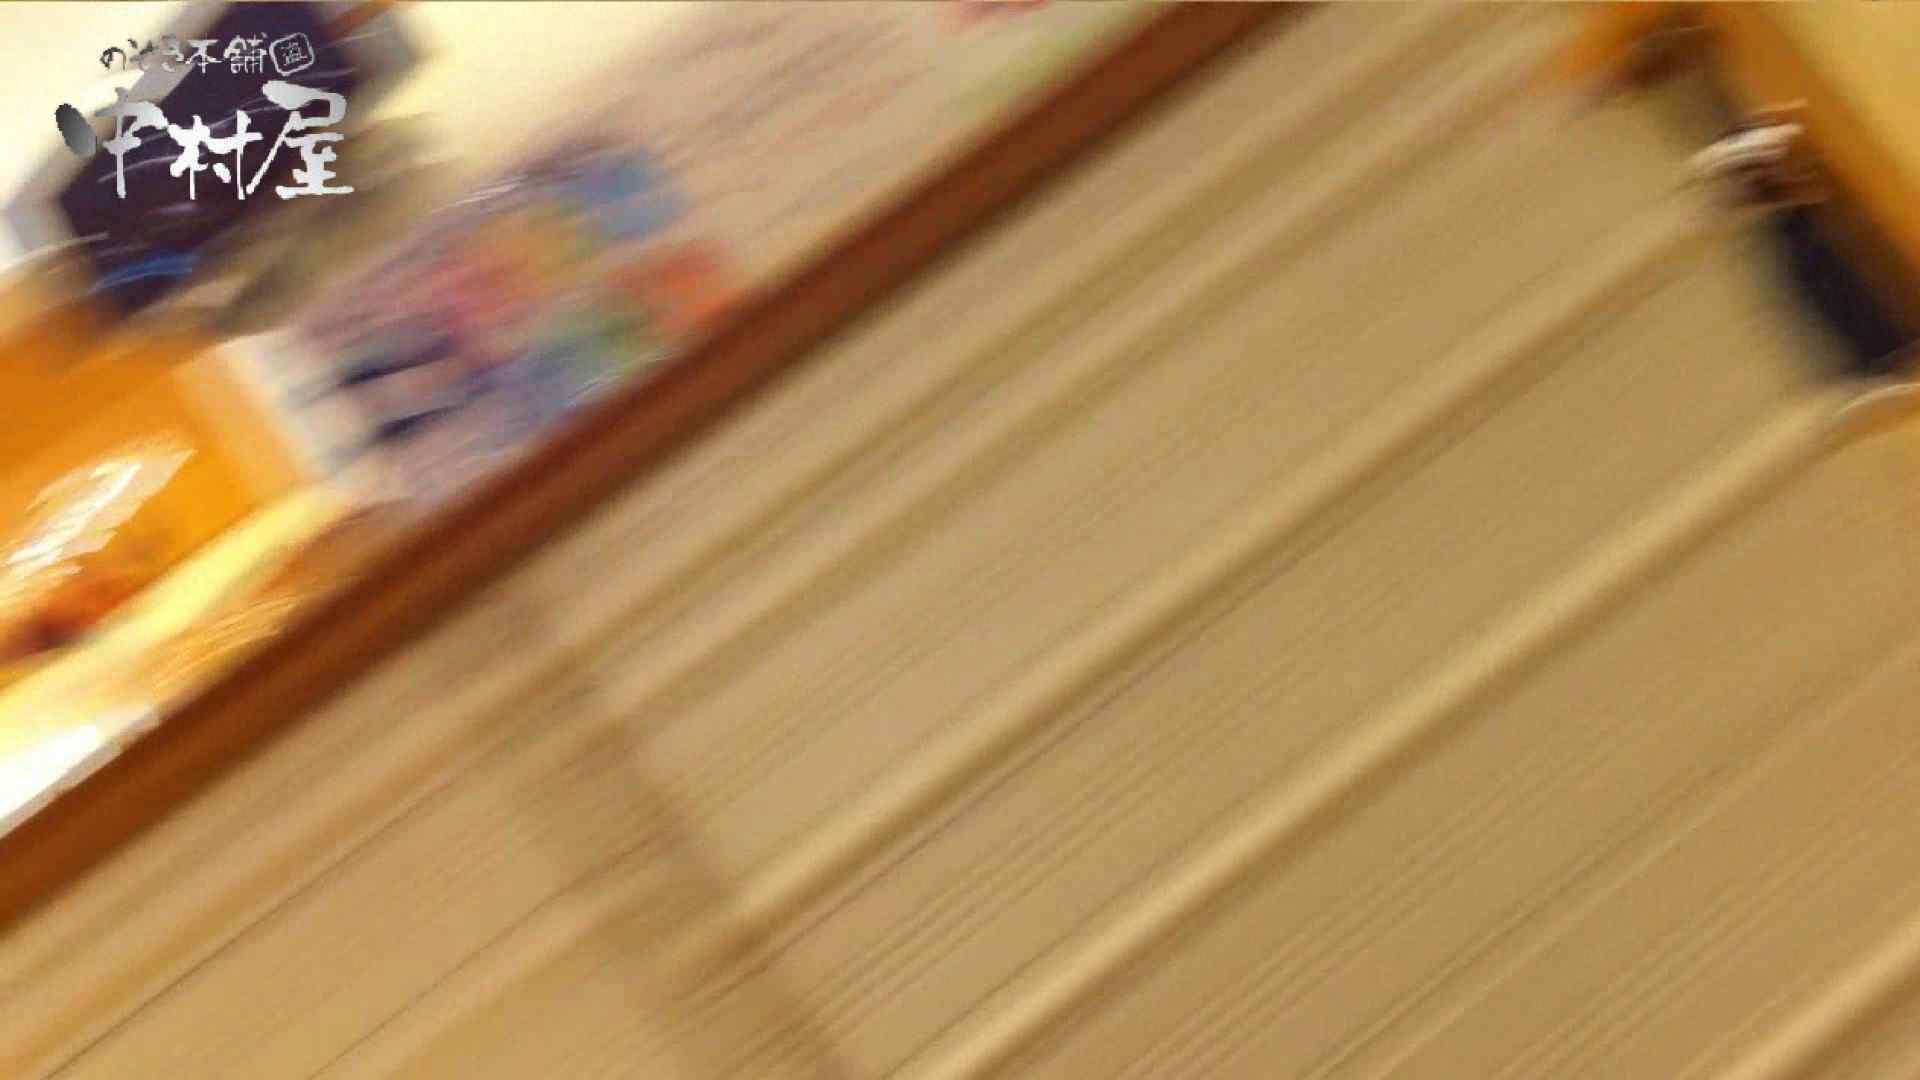 vol.65 美人アパレル胸チラ&パンチラ ムッチリ感がいい感じ花がらパンツさん 接写   胸チラ  57連発 16